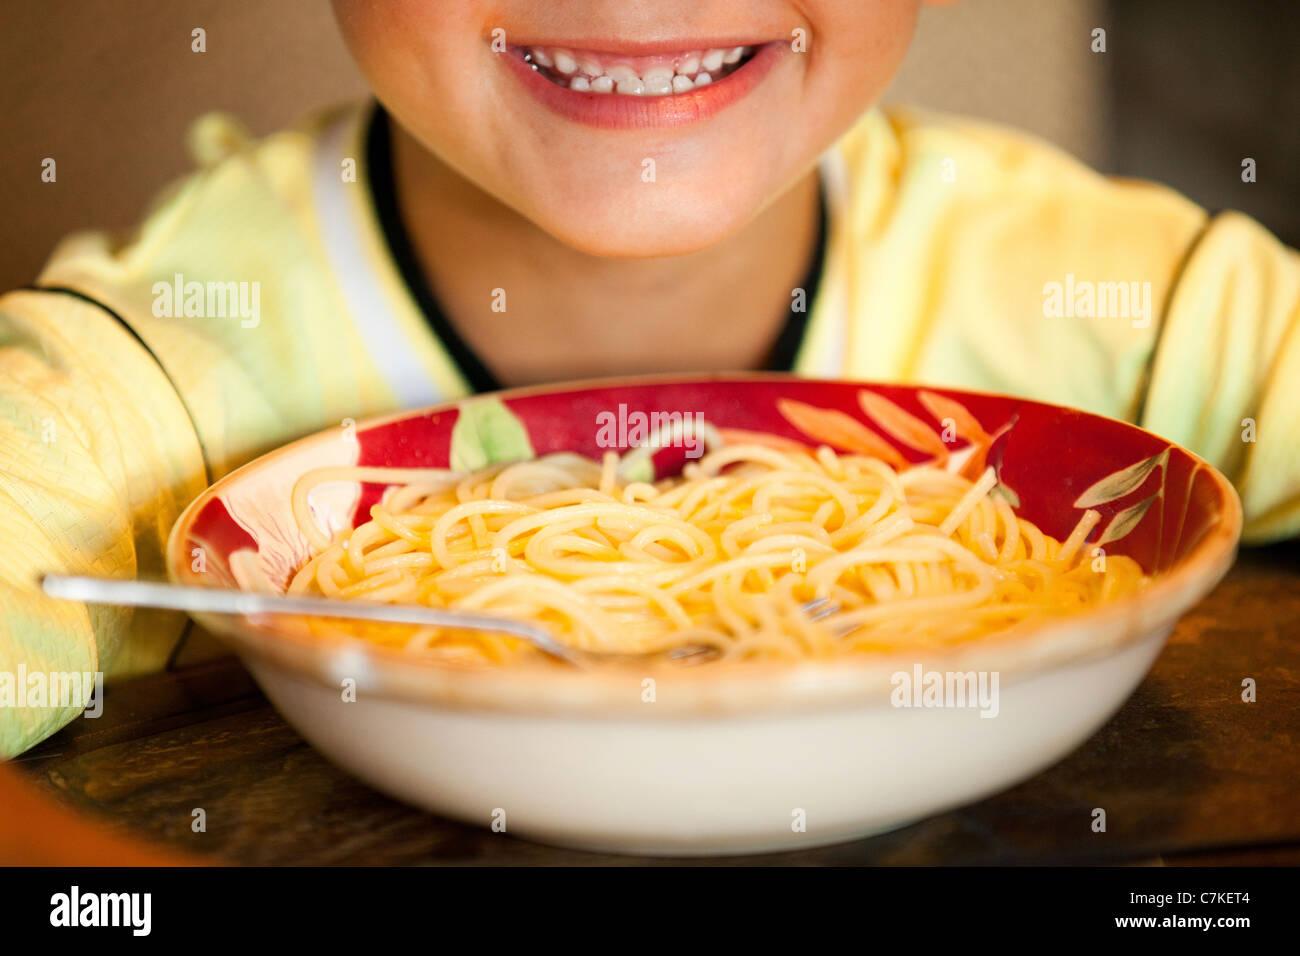 Boy and Spaghetti Bowl - Stock Image